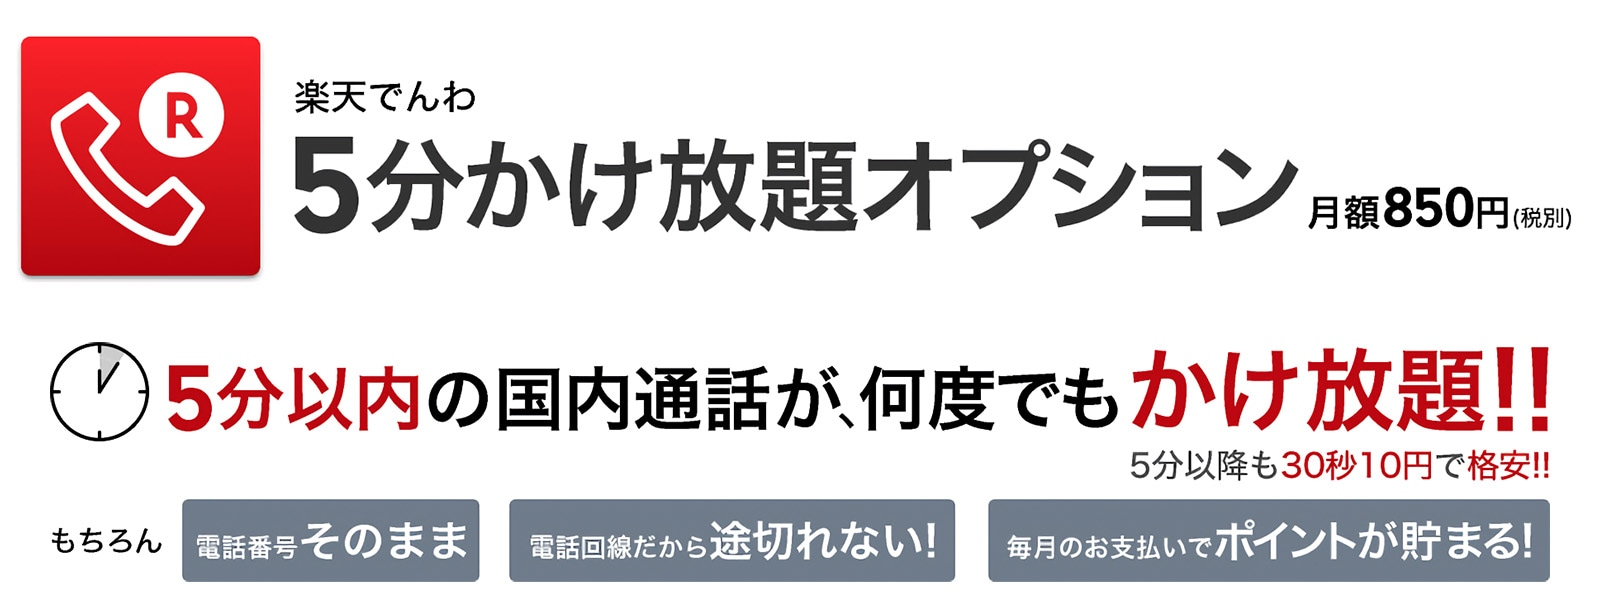 rakuten-mobile-komikomi-kakehoudai